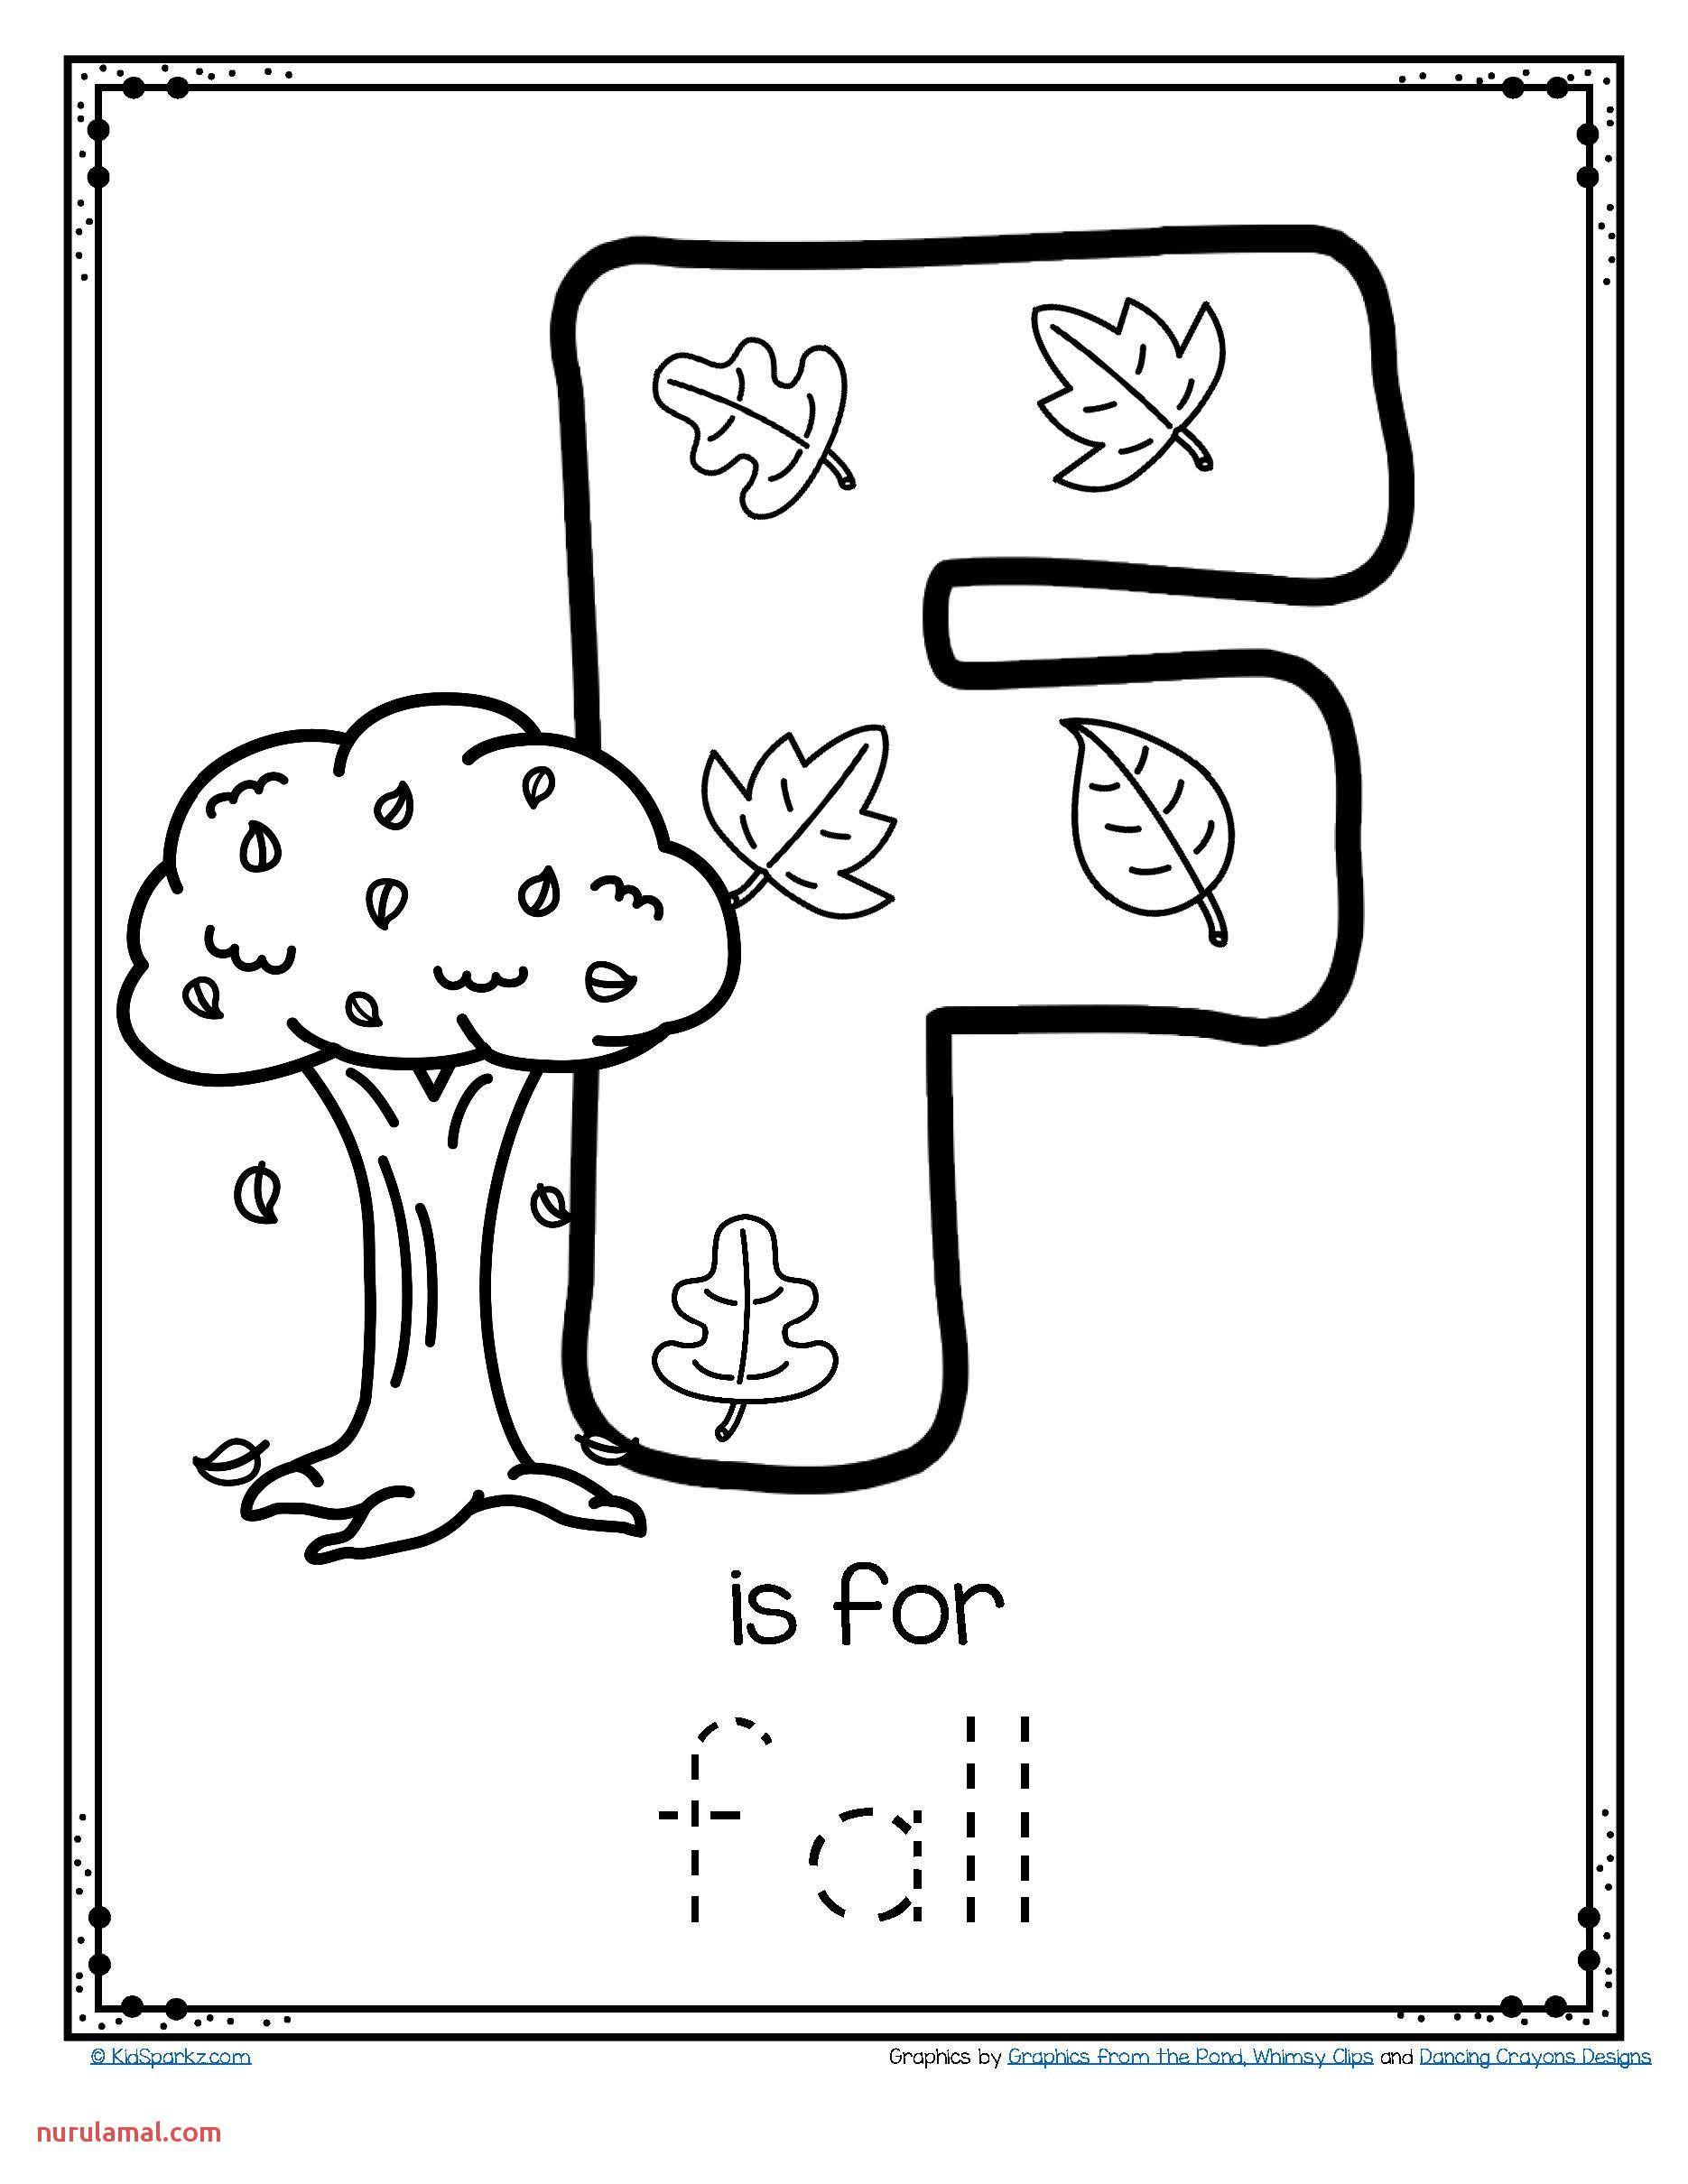 Printable Toddler Worksheets Comparing In